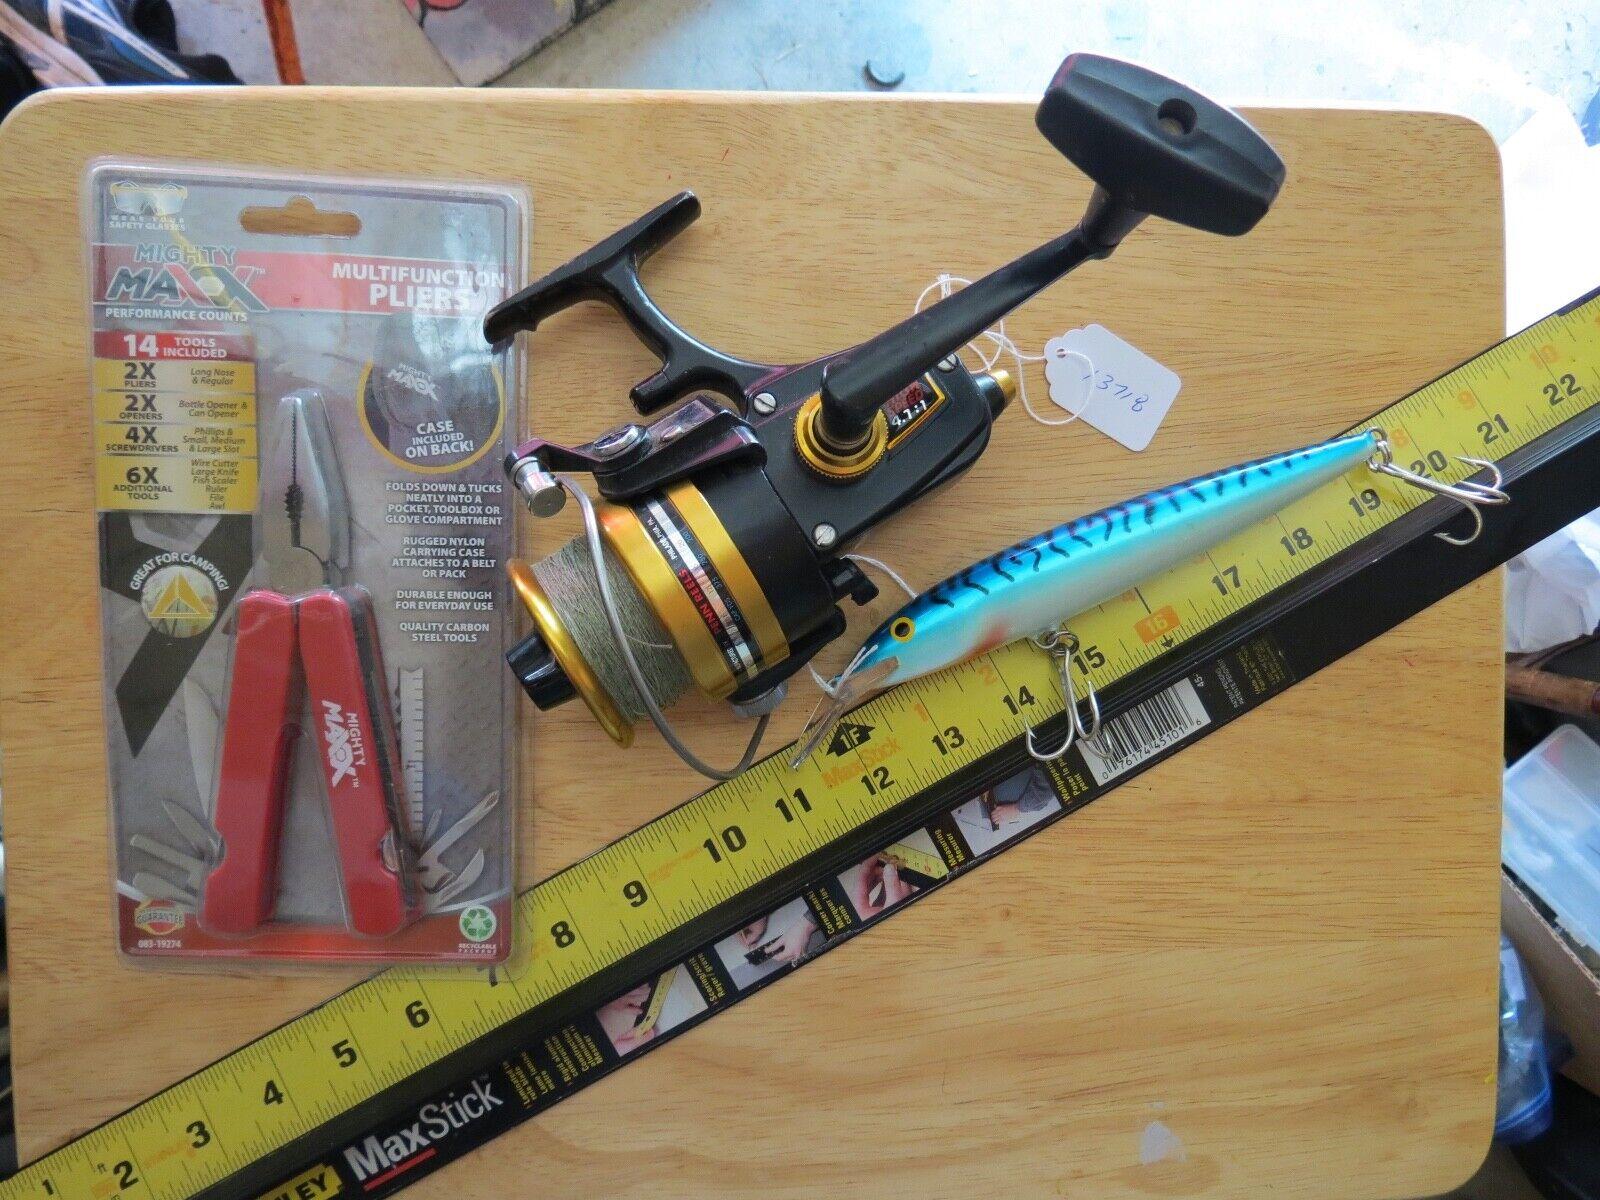 Penn 6500 Surf fishing  reel & pliers and fishing lure (lot)  online-shop